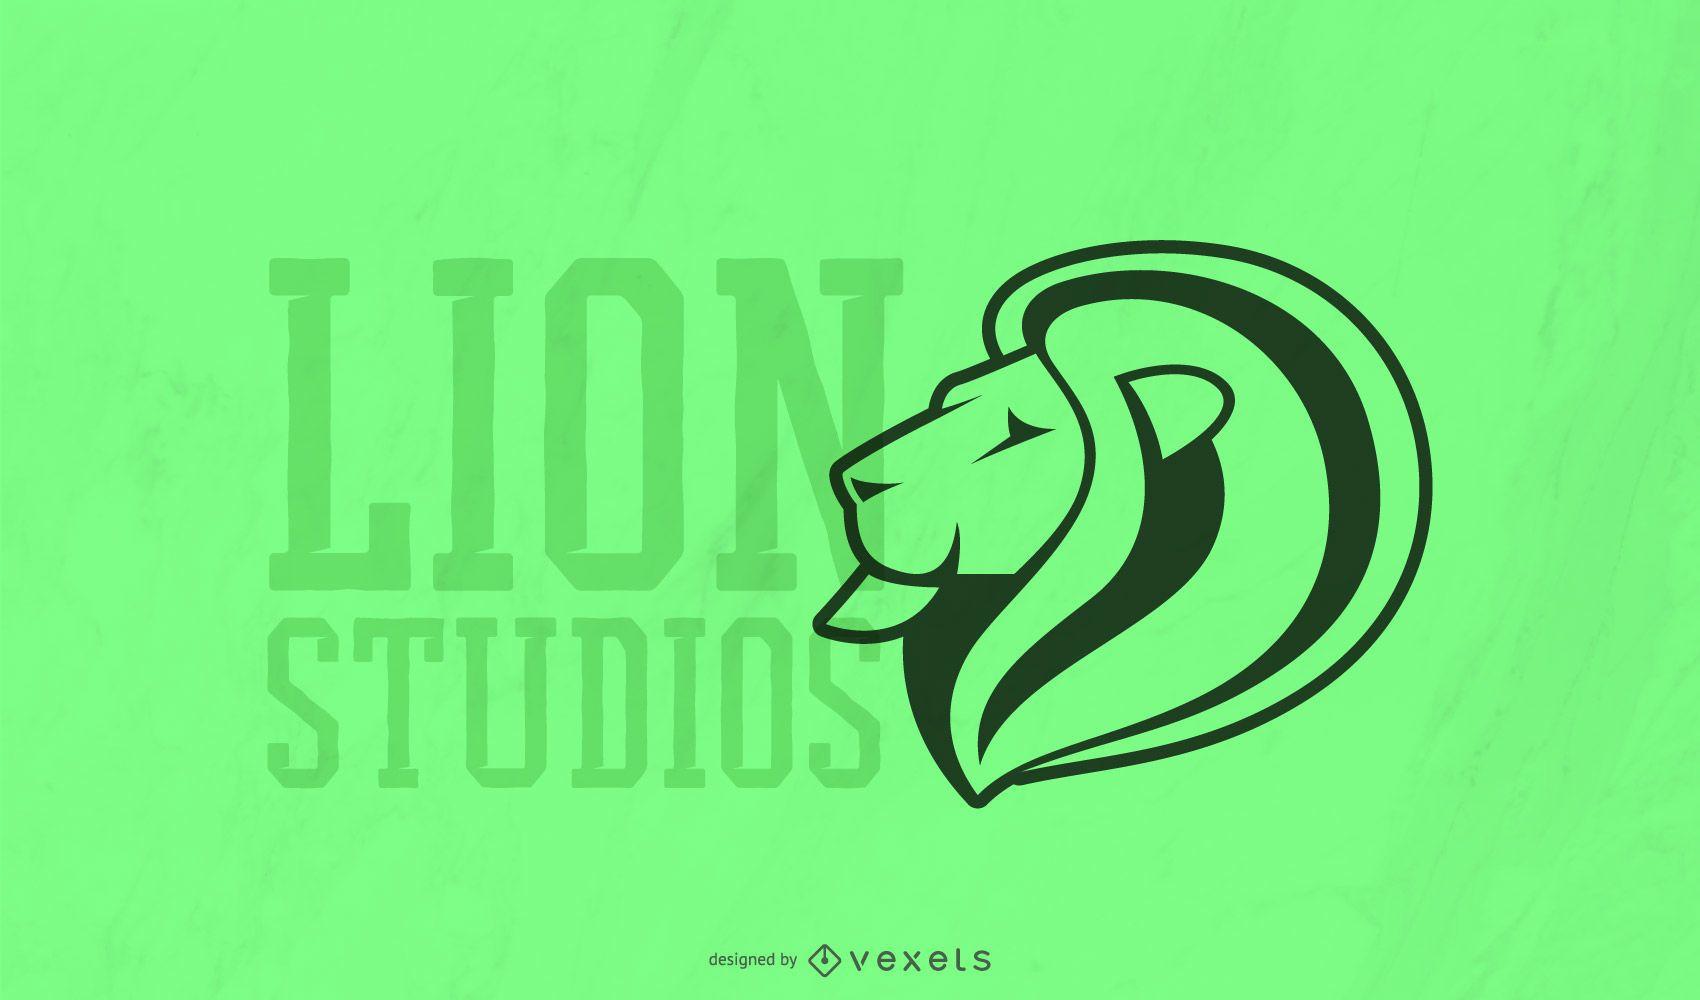 Lion studios logo template